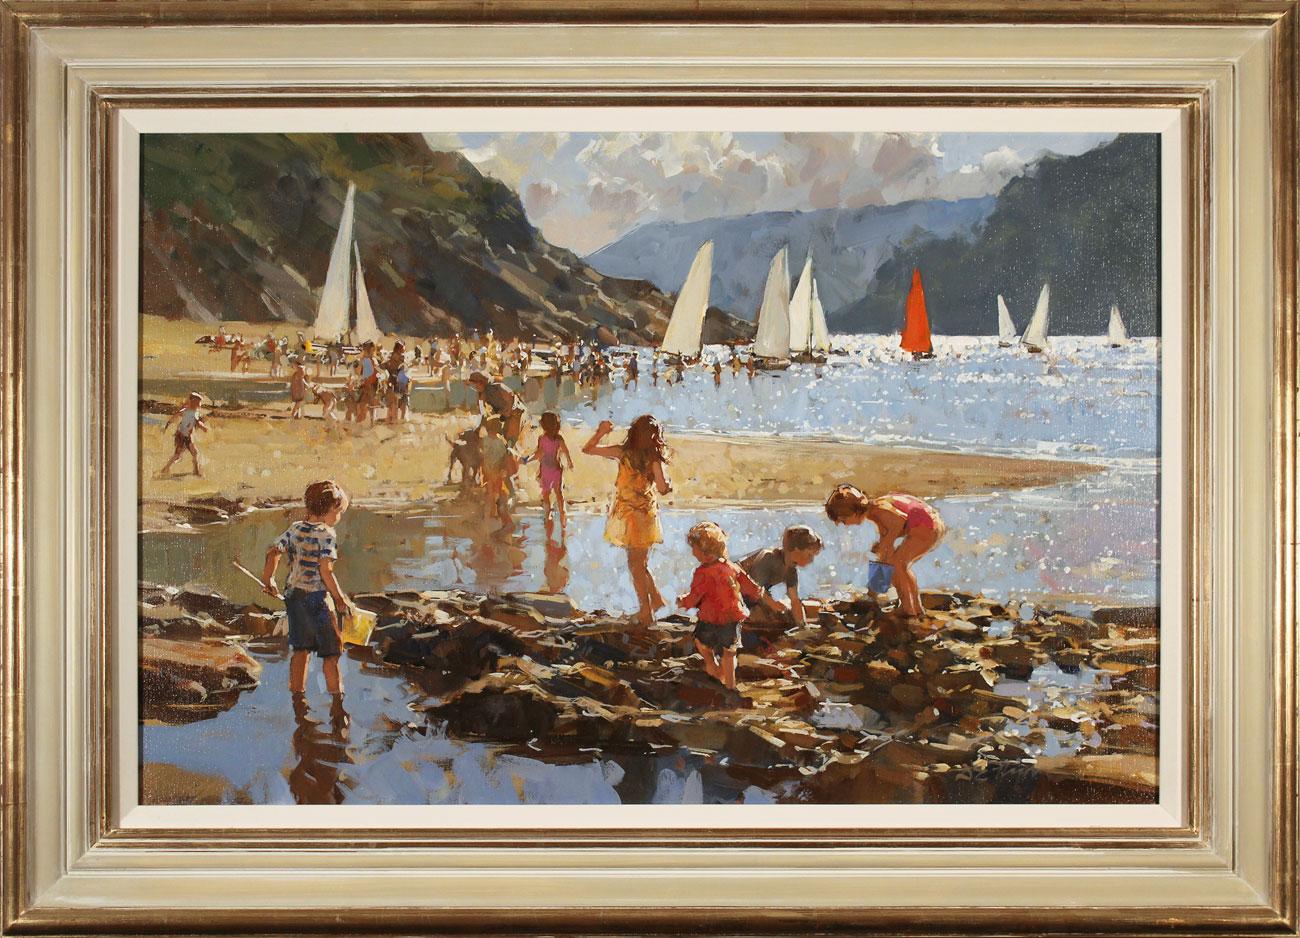 Dianne Flynn, Original acrylic painting on canvas, Ebbtide, Salcombe, click to enlarge